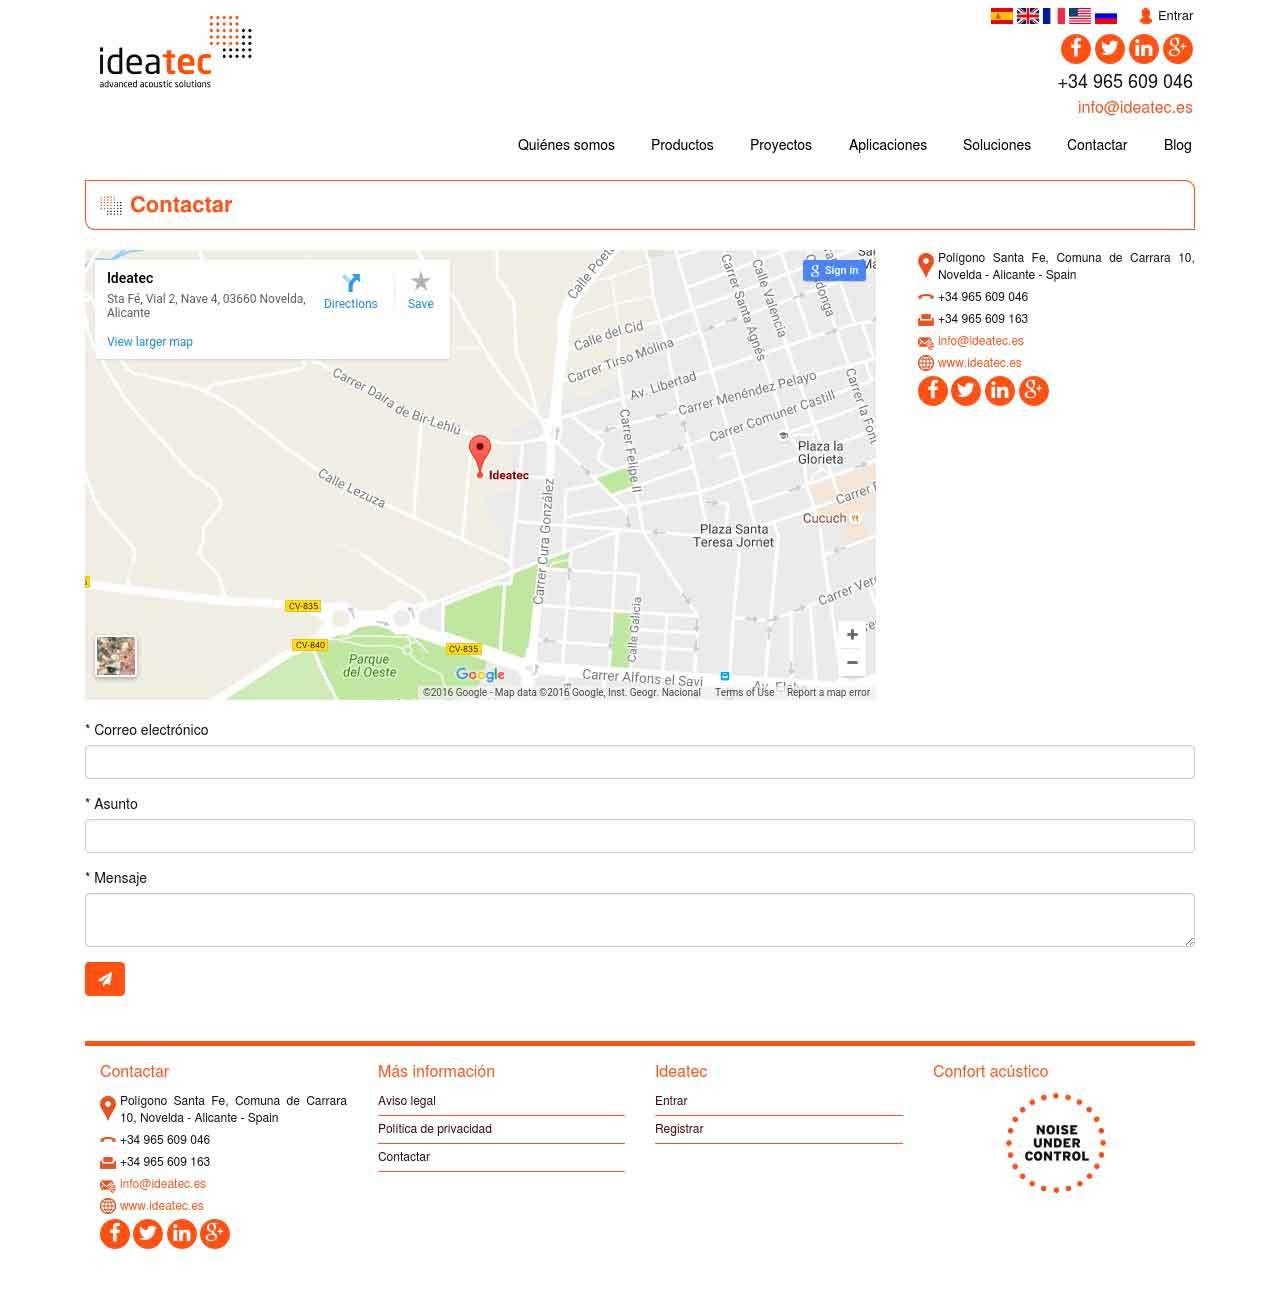 Agencia Sidecar ideatec-contacto-agencia-sidecar Ideatec